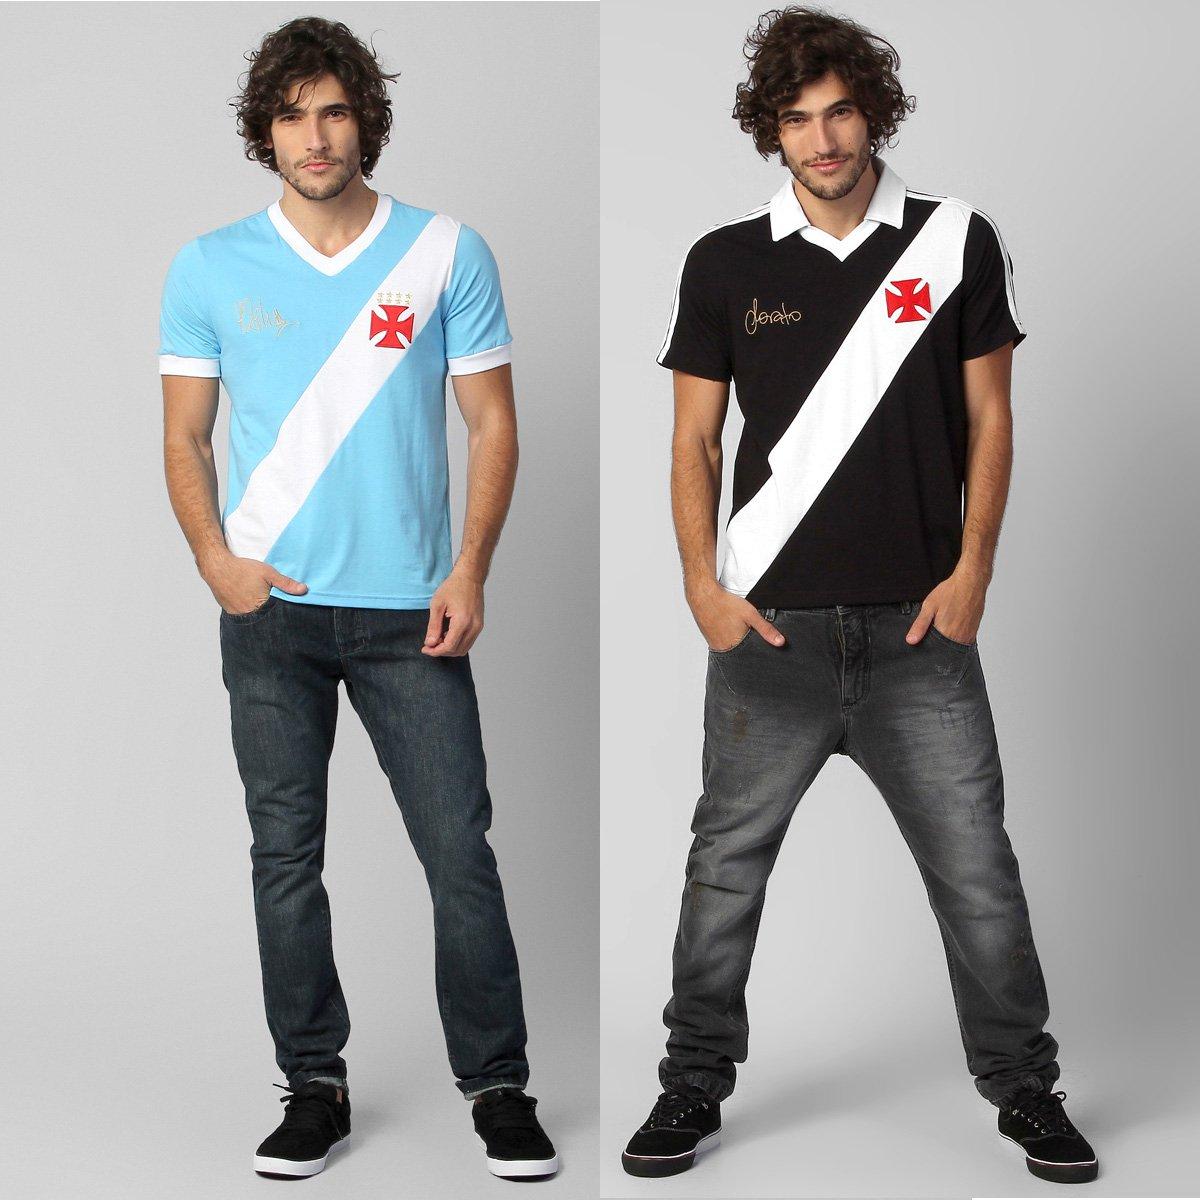 Kit Vasco - Camisa Retrô Sorato + Camiseta Martin Silva - Compre Agora  01e9768231d8b